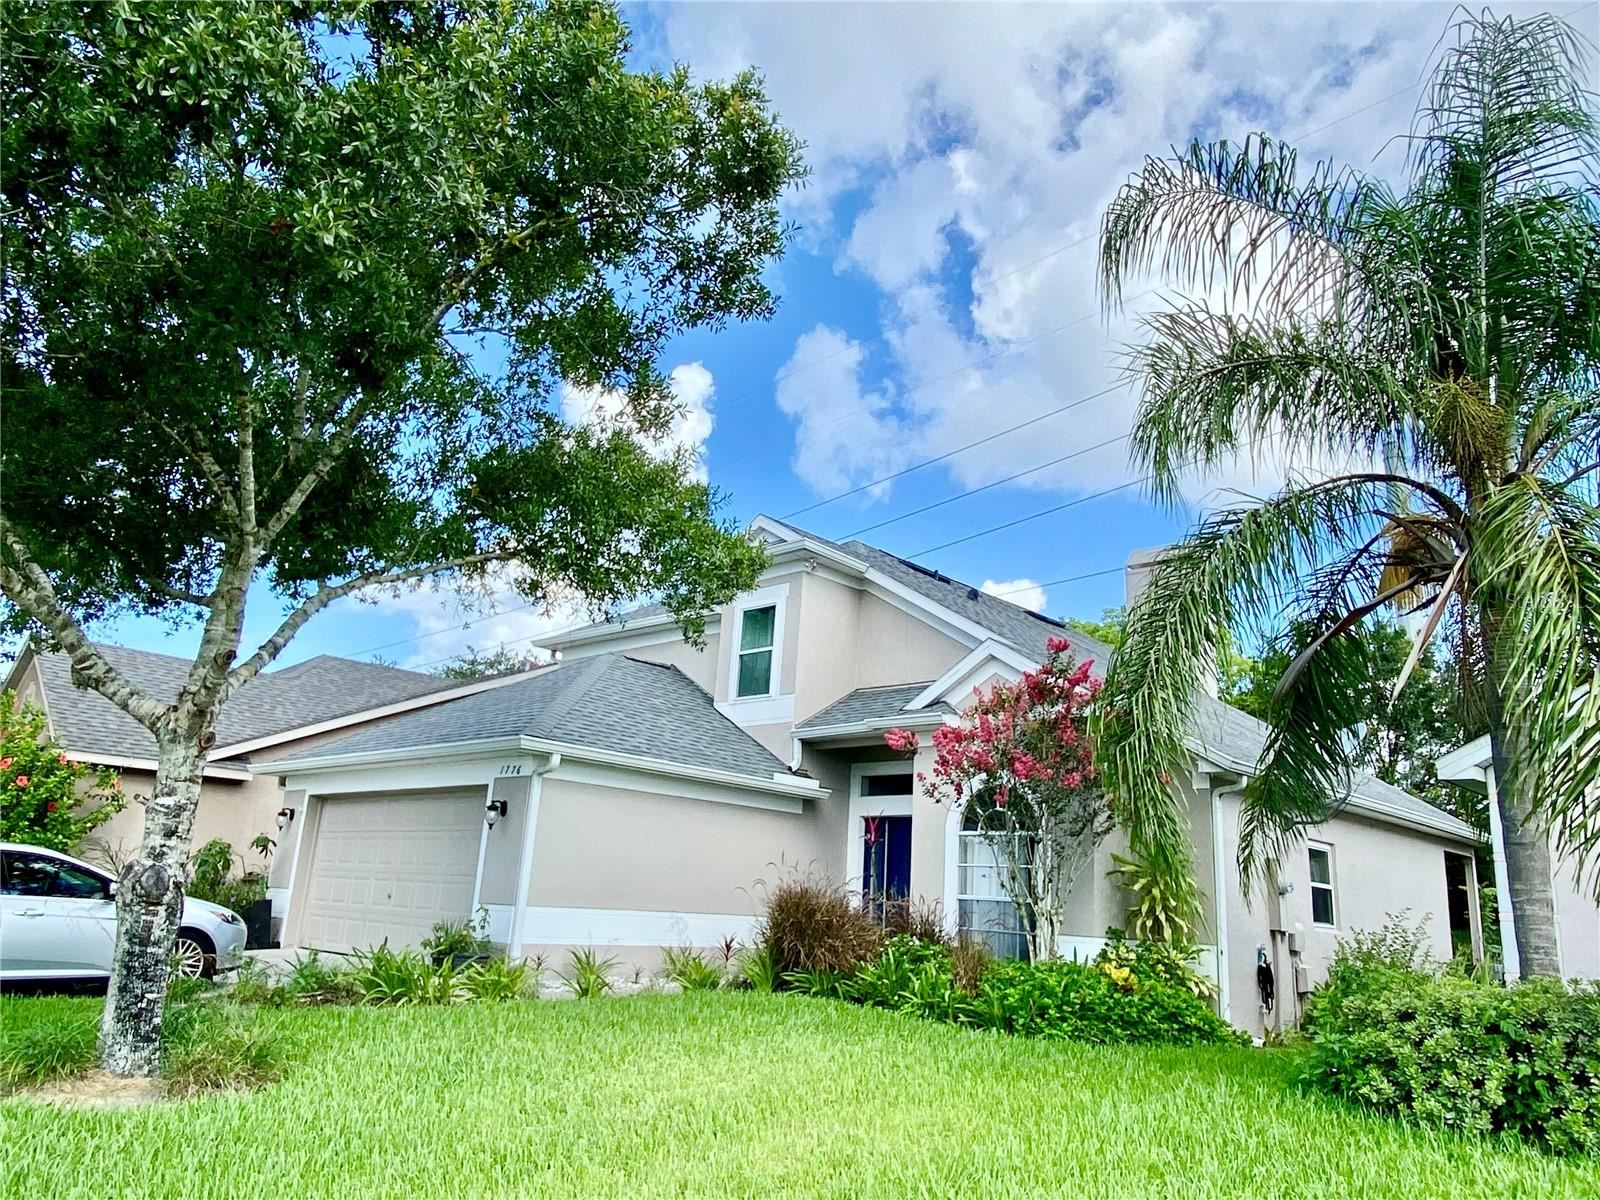 1776 PINE BAY DRIVE, Lake Mary, FL 32746 - MLS#: O5957490